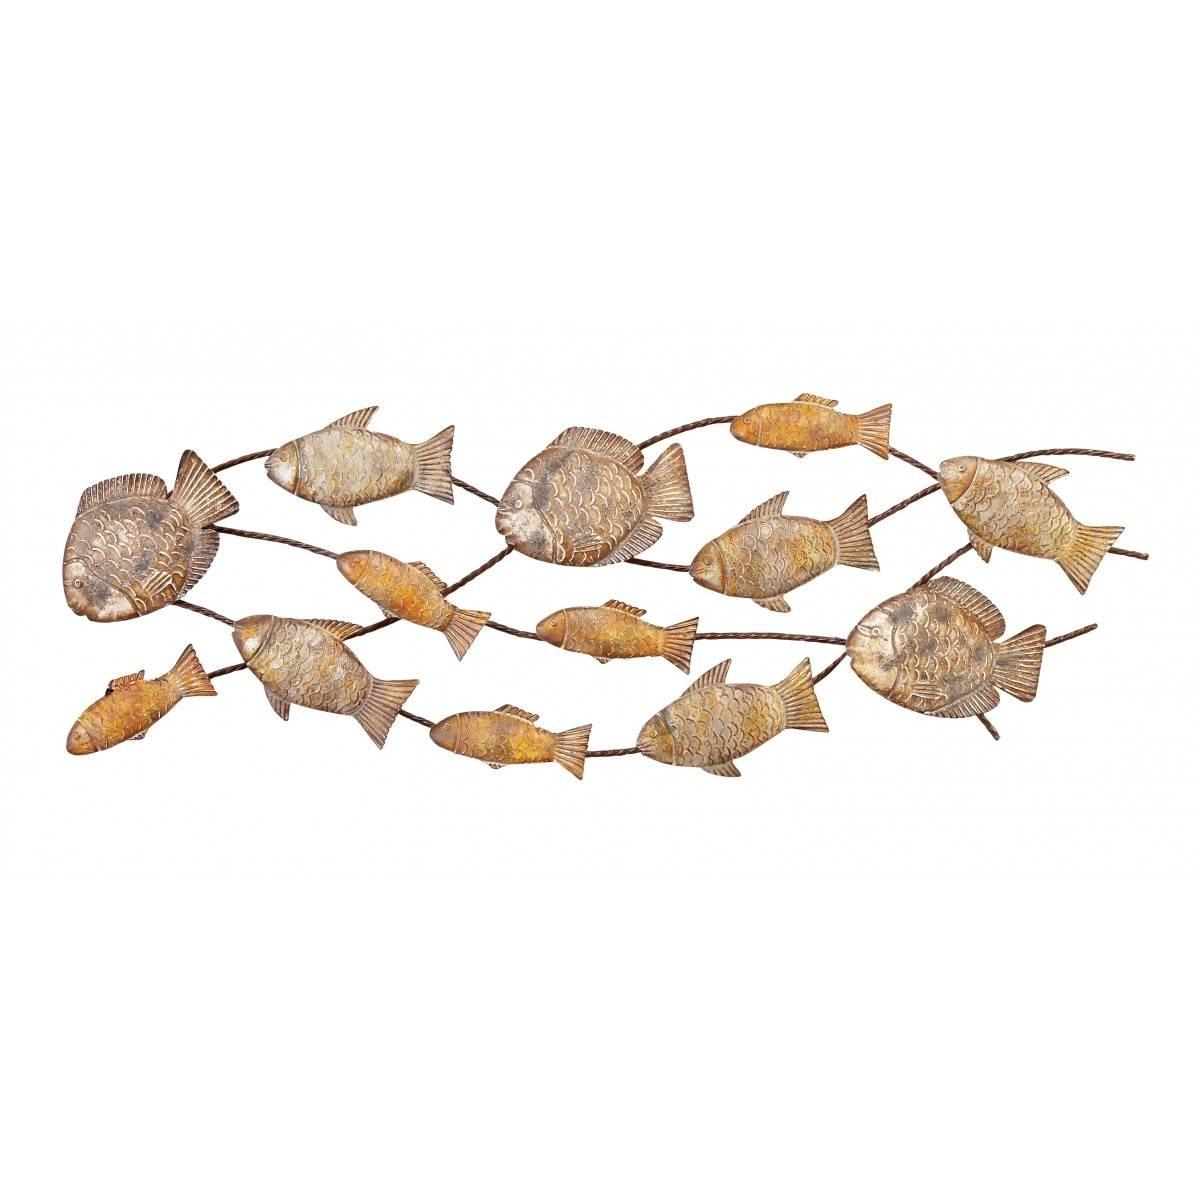 Of Fish Metal Wall Art Regarding Newest Fish Metal Wall Art (View 11 of 20)